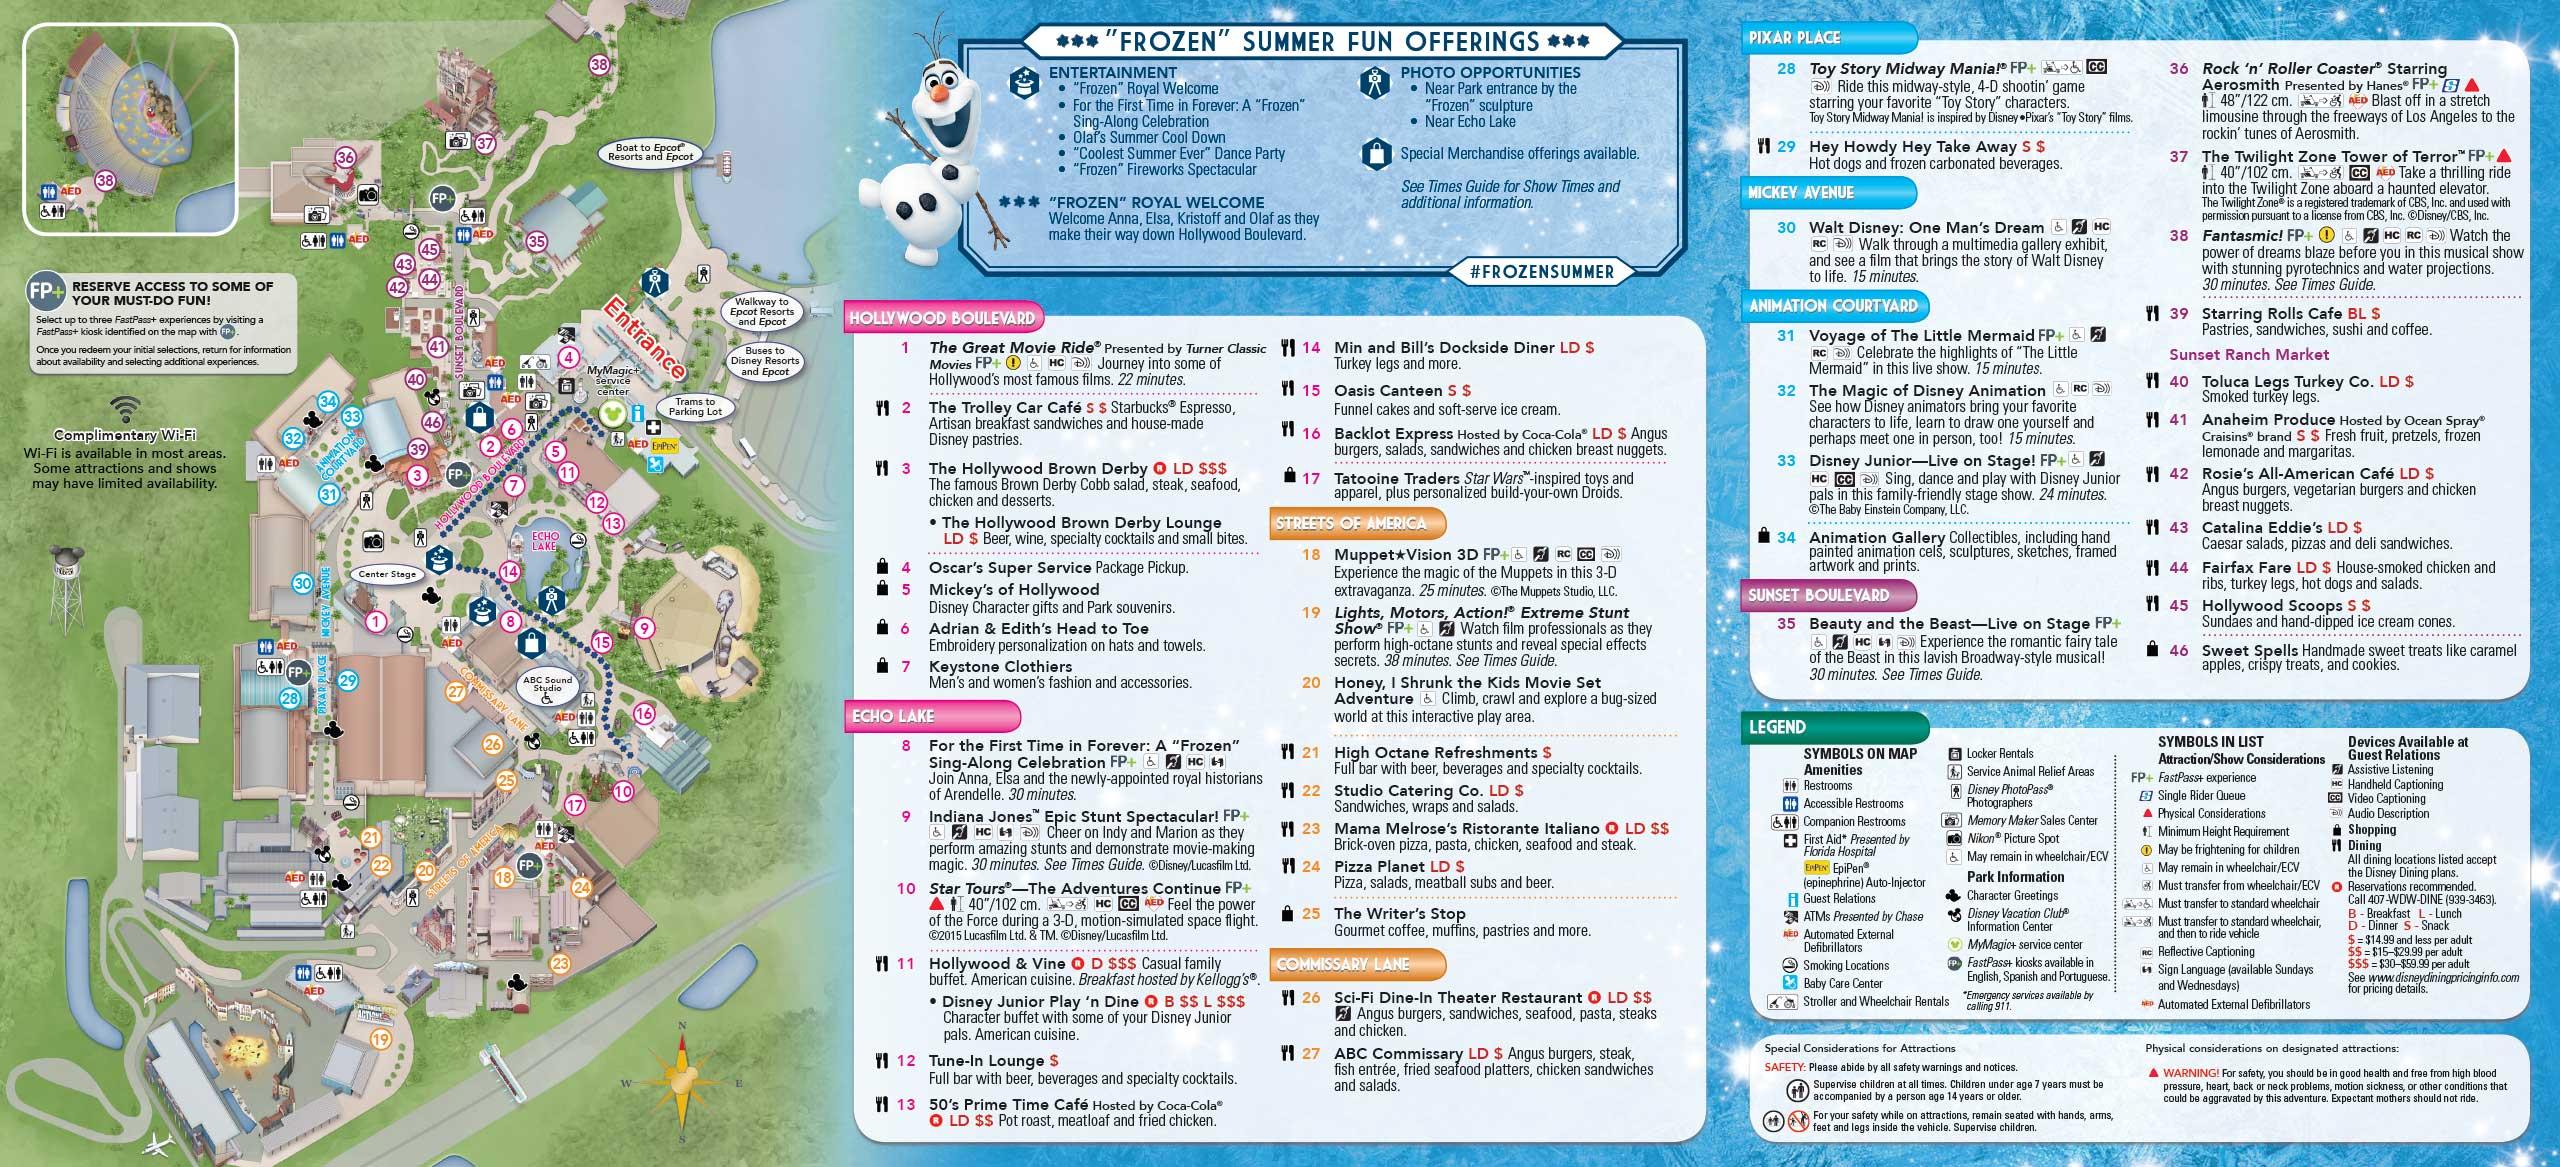 May 2015 Walt Disney World Resort Park Maps - Photo 5 of 14